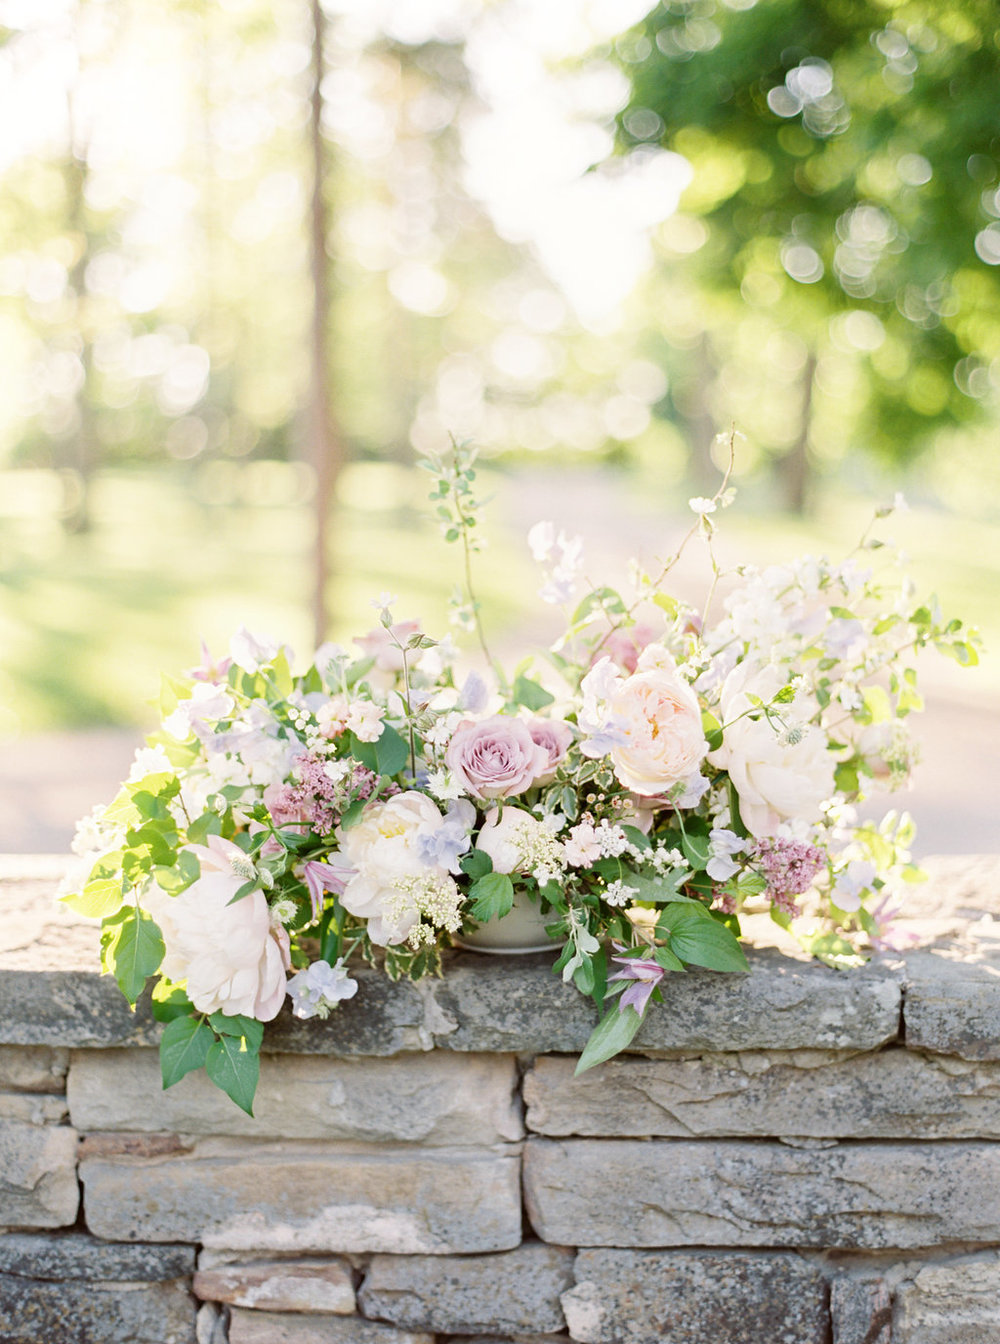 SpringBlossomTablescape-5.jpg